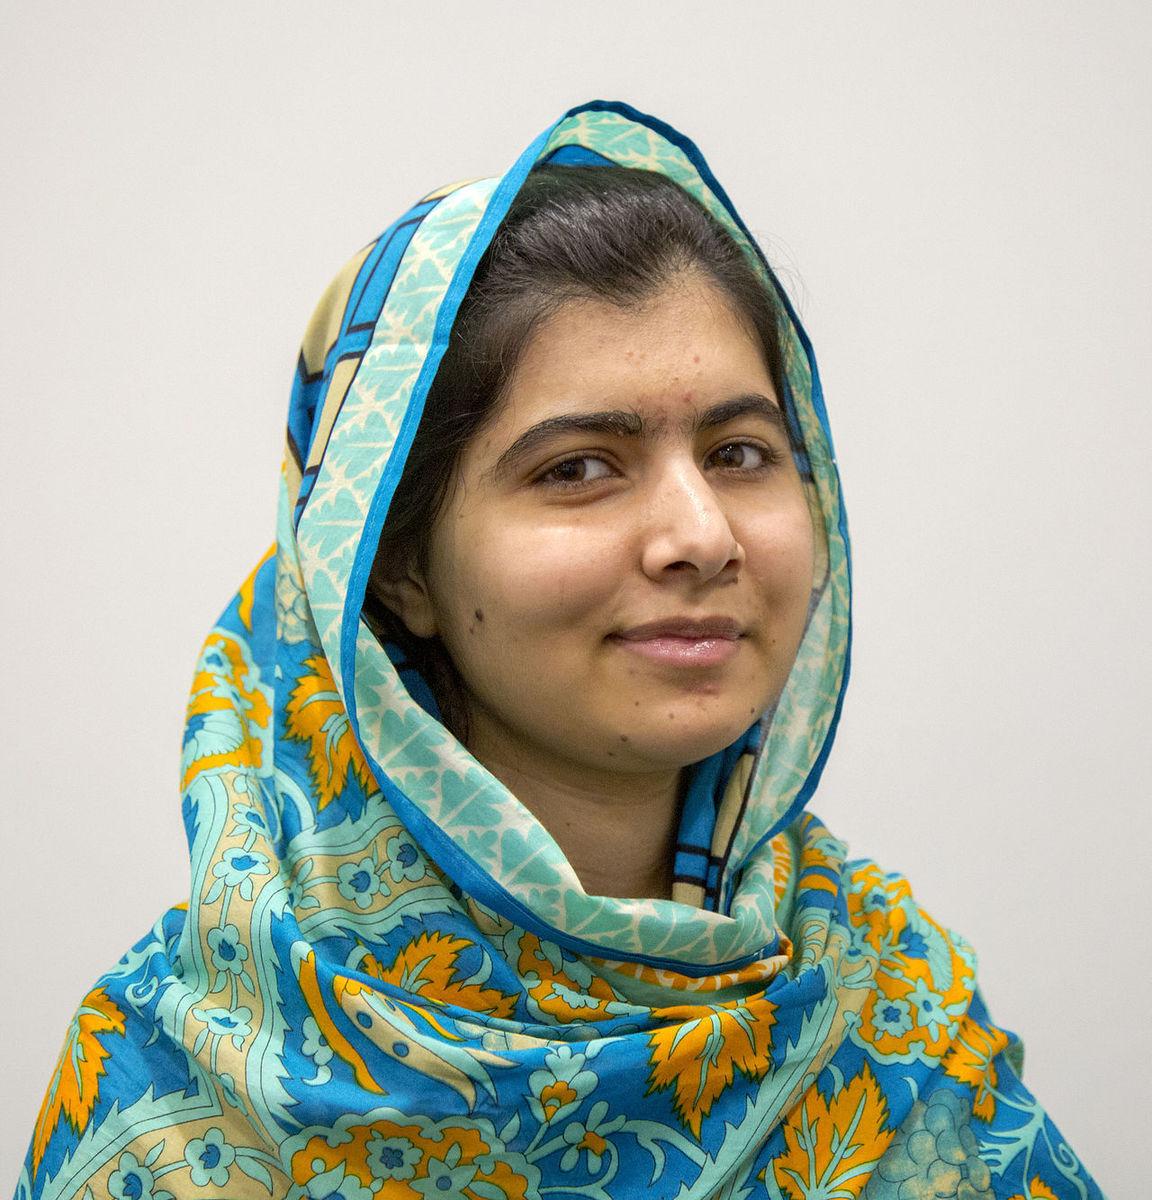 Standard malala yousafzai 2015